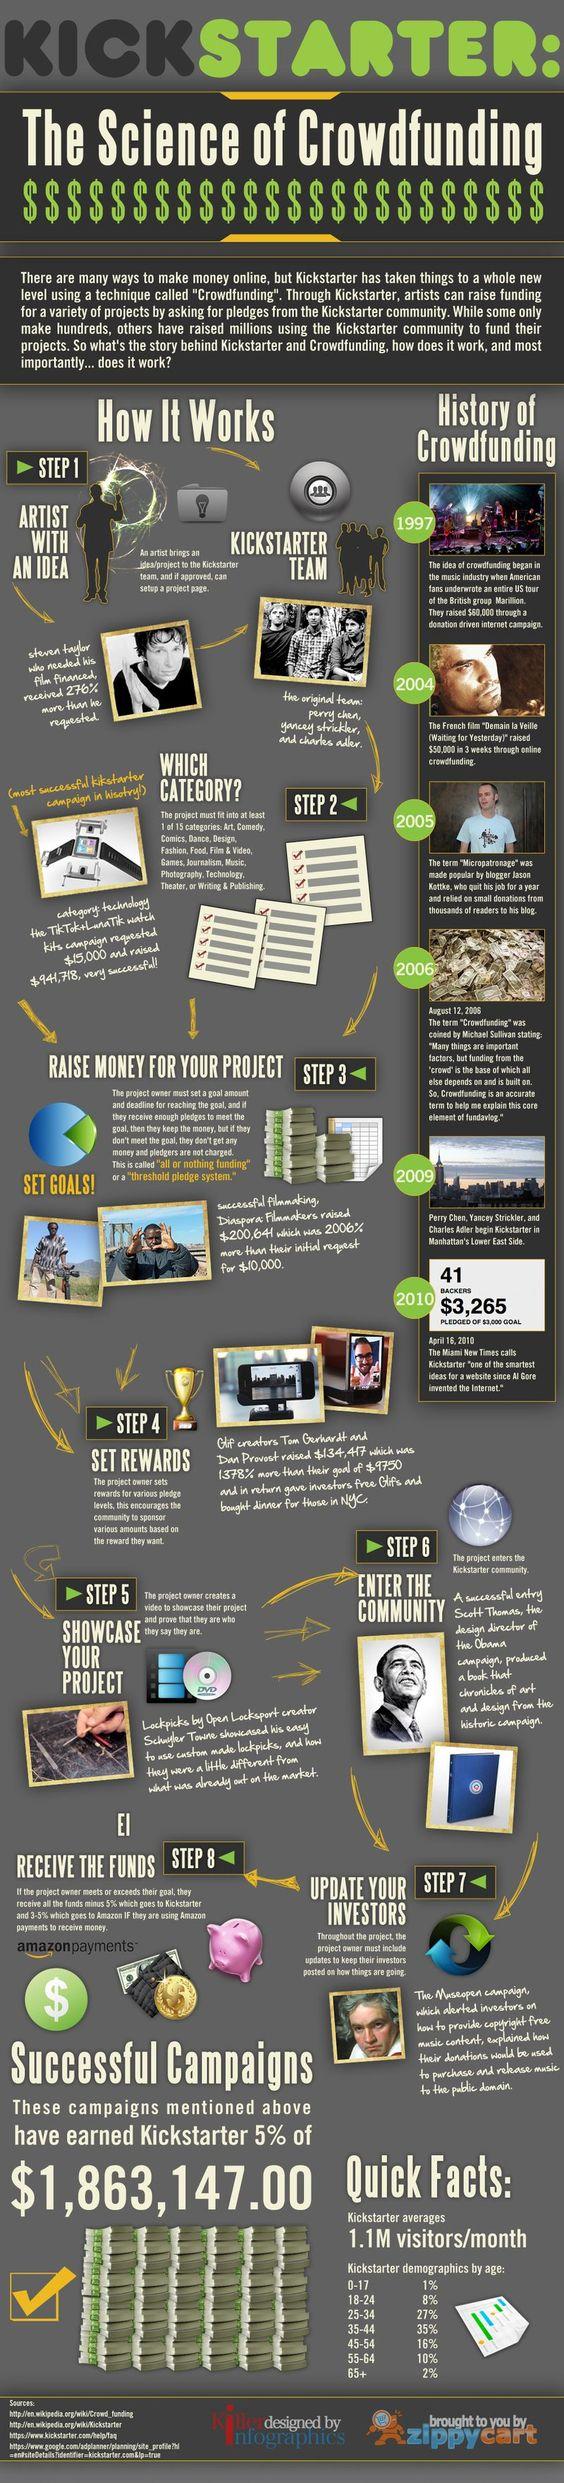 Kickstarter Infographic - Crowdfunding is the future